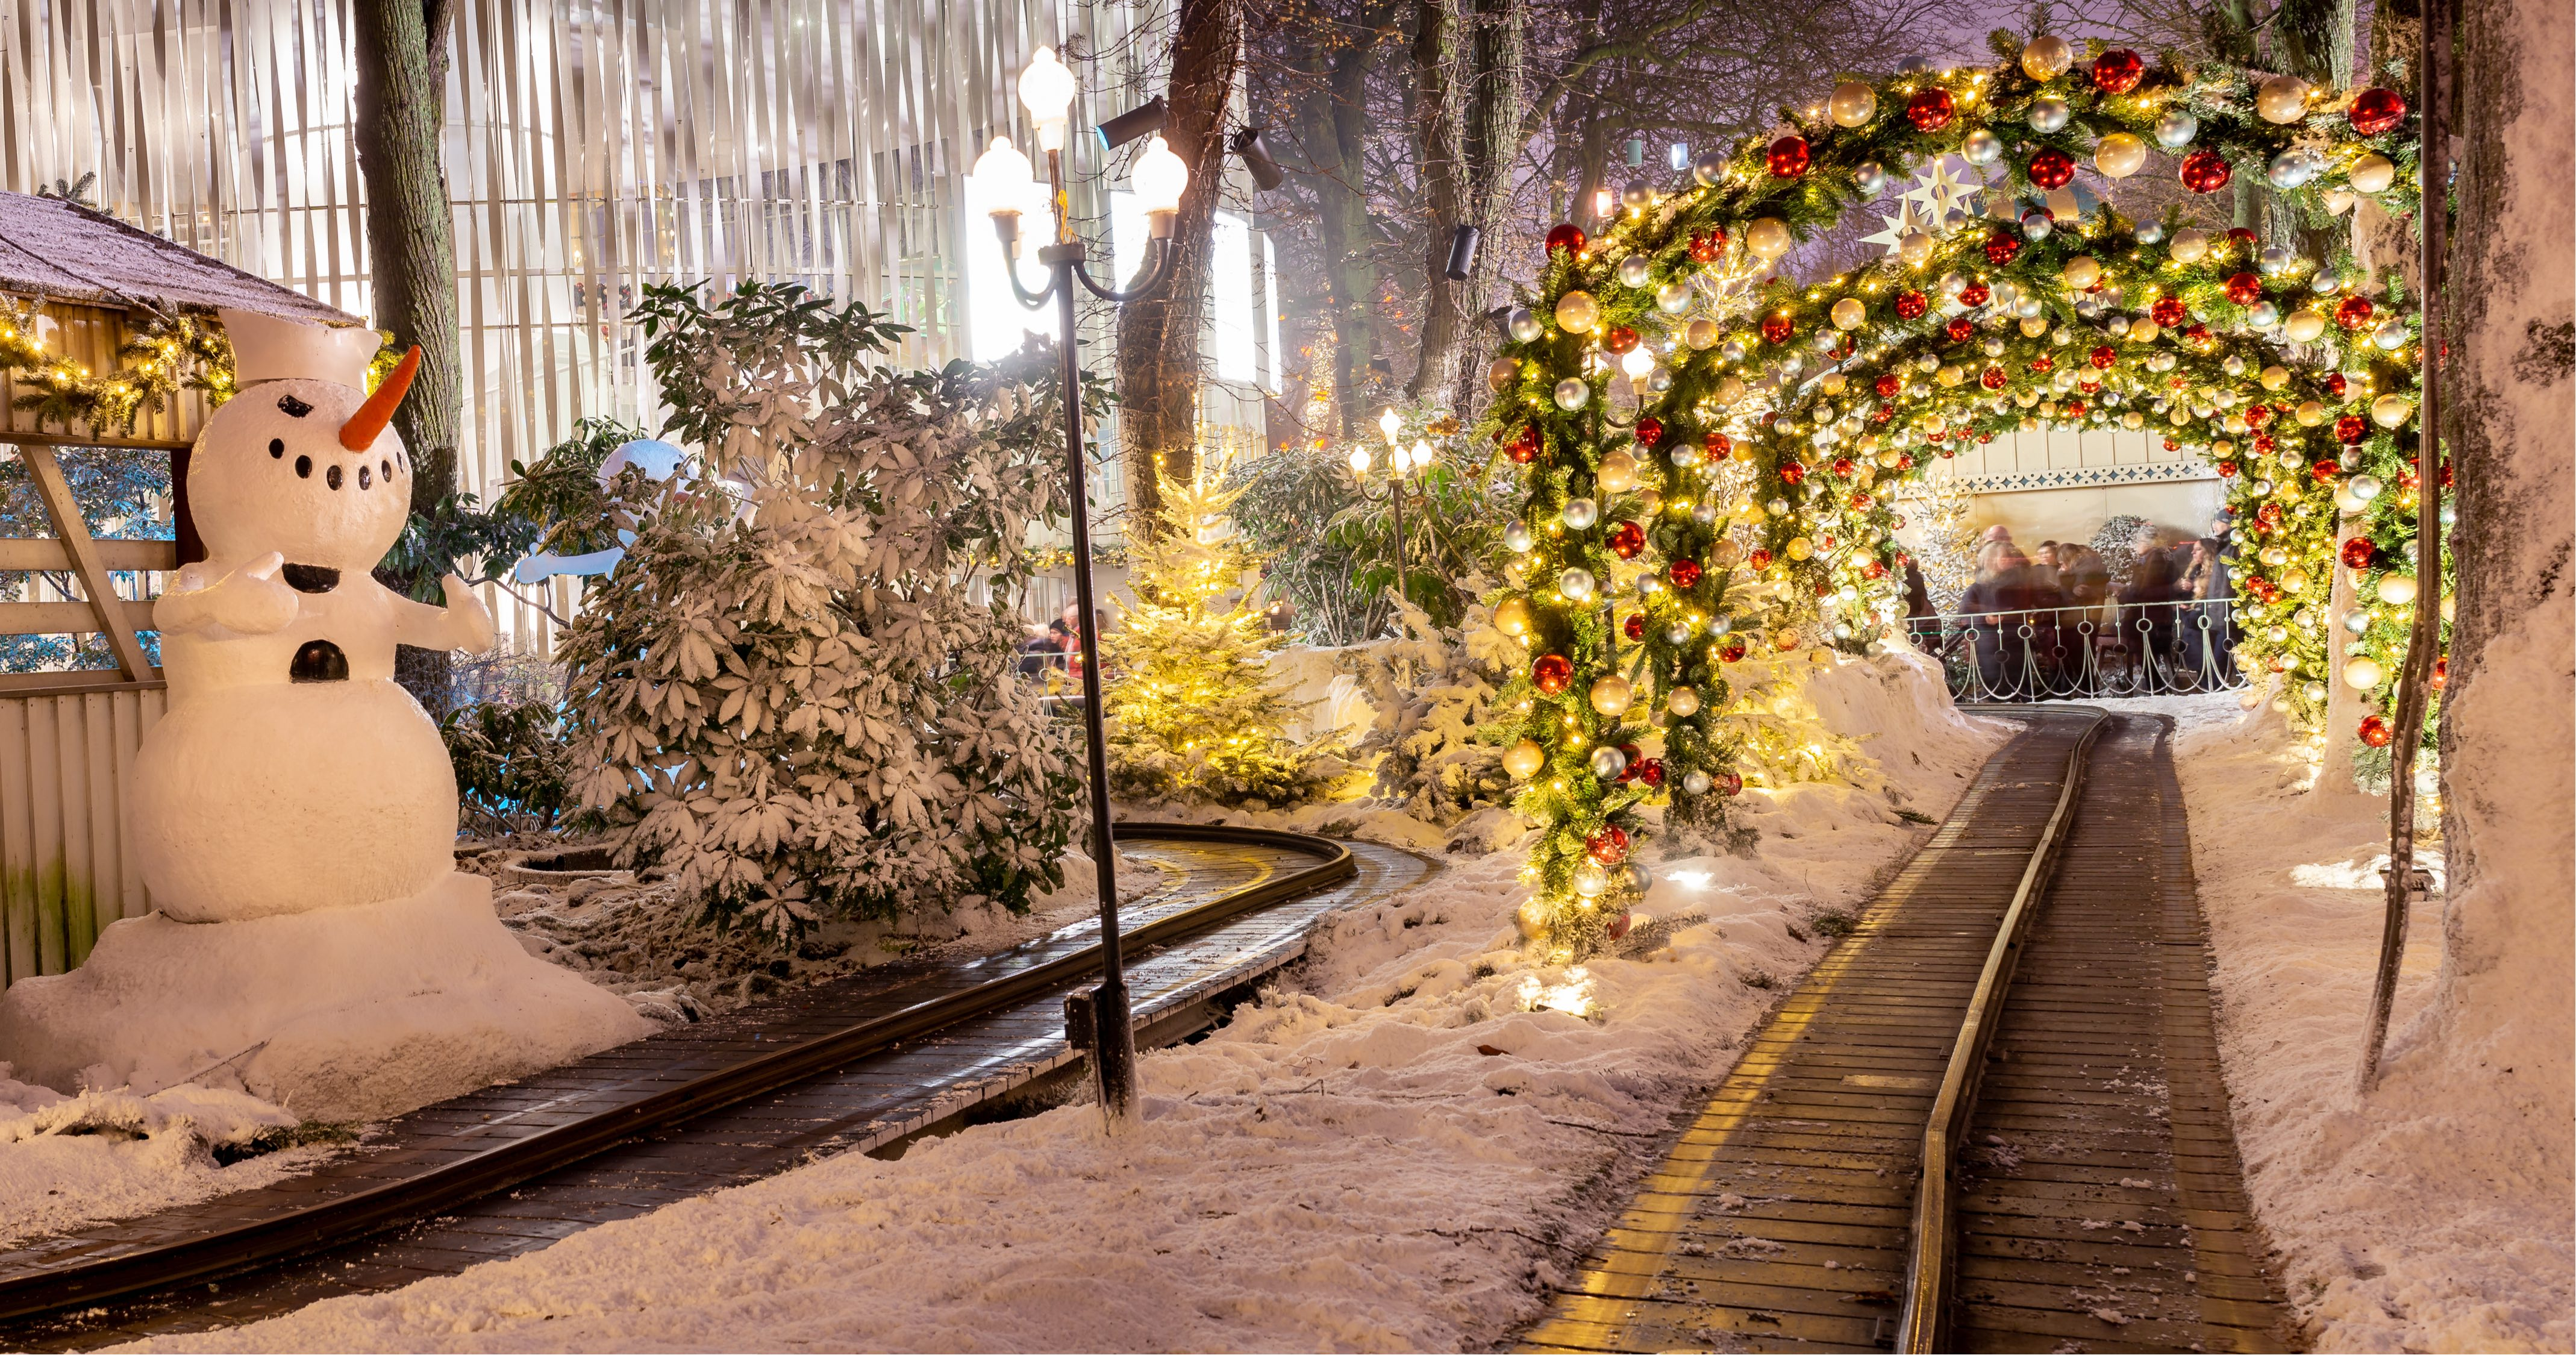 a&o Hostels tipt zes bijzondere kerstmarkten in Europa